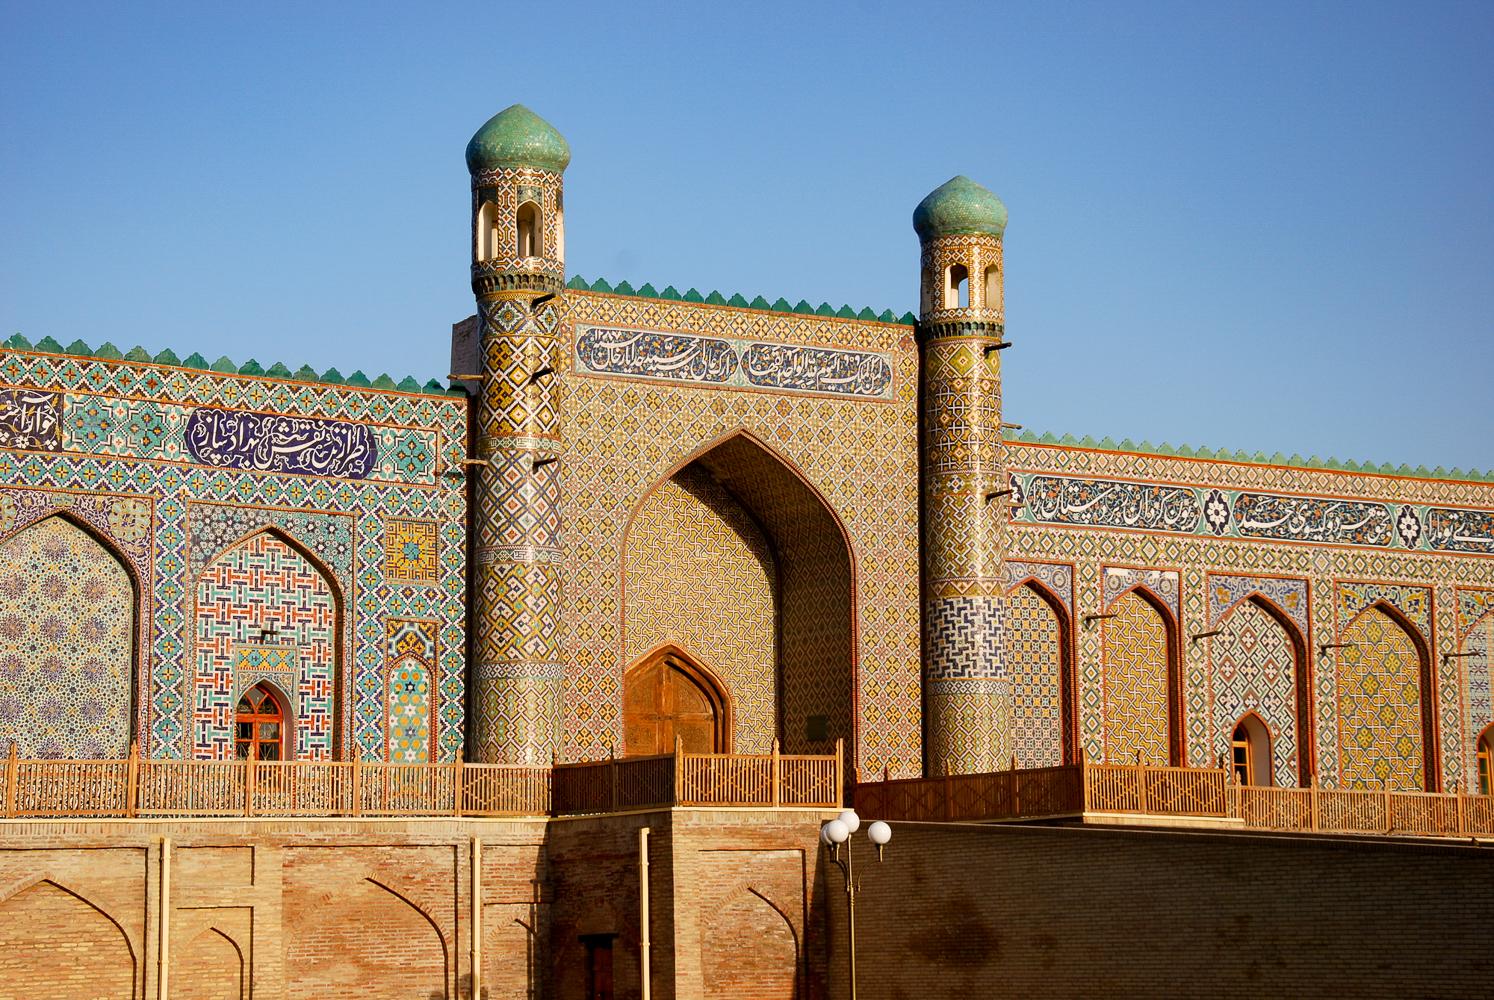 Arabic inscription on Khudoyar Khan Palace, Kokand